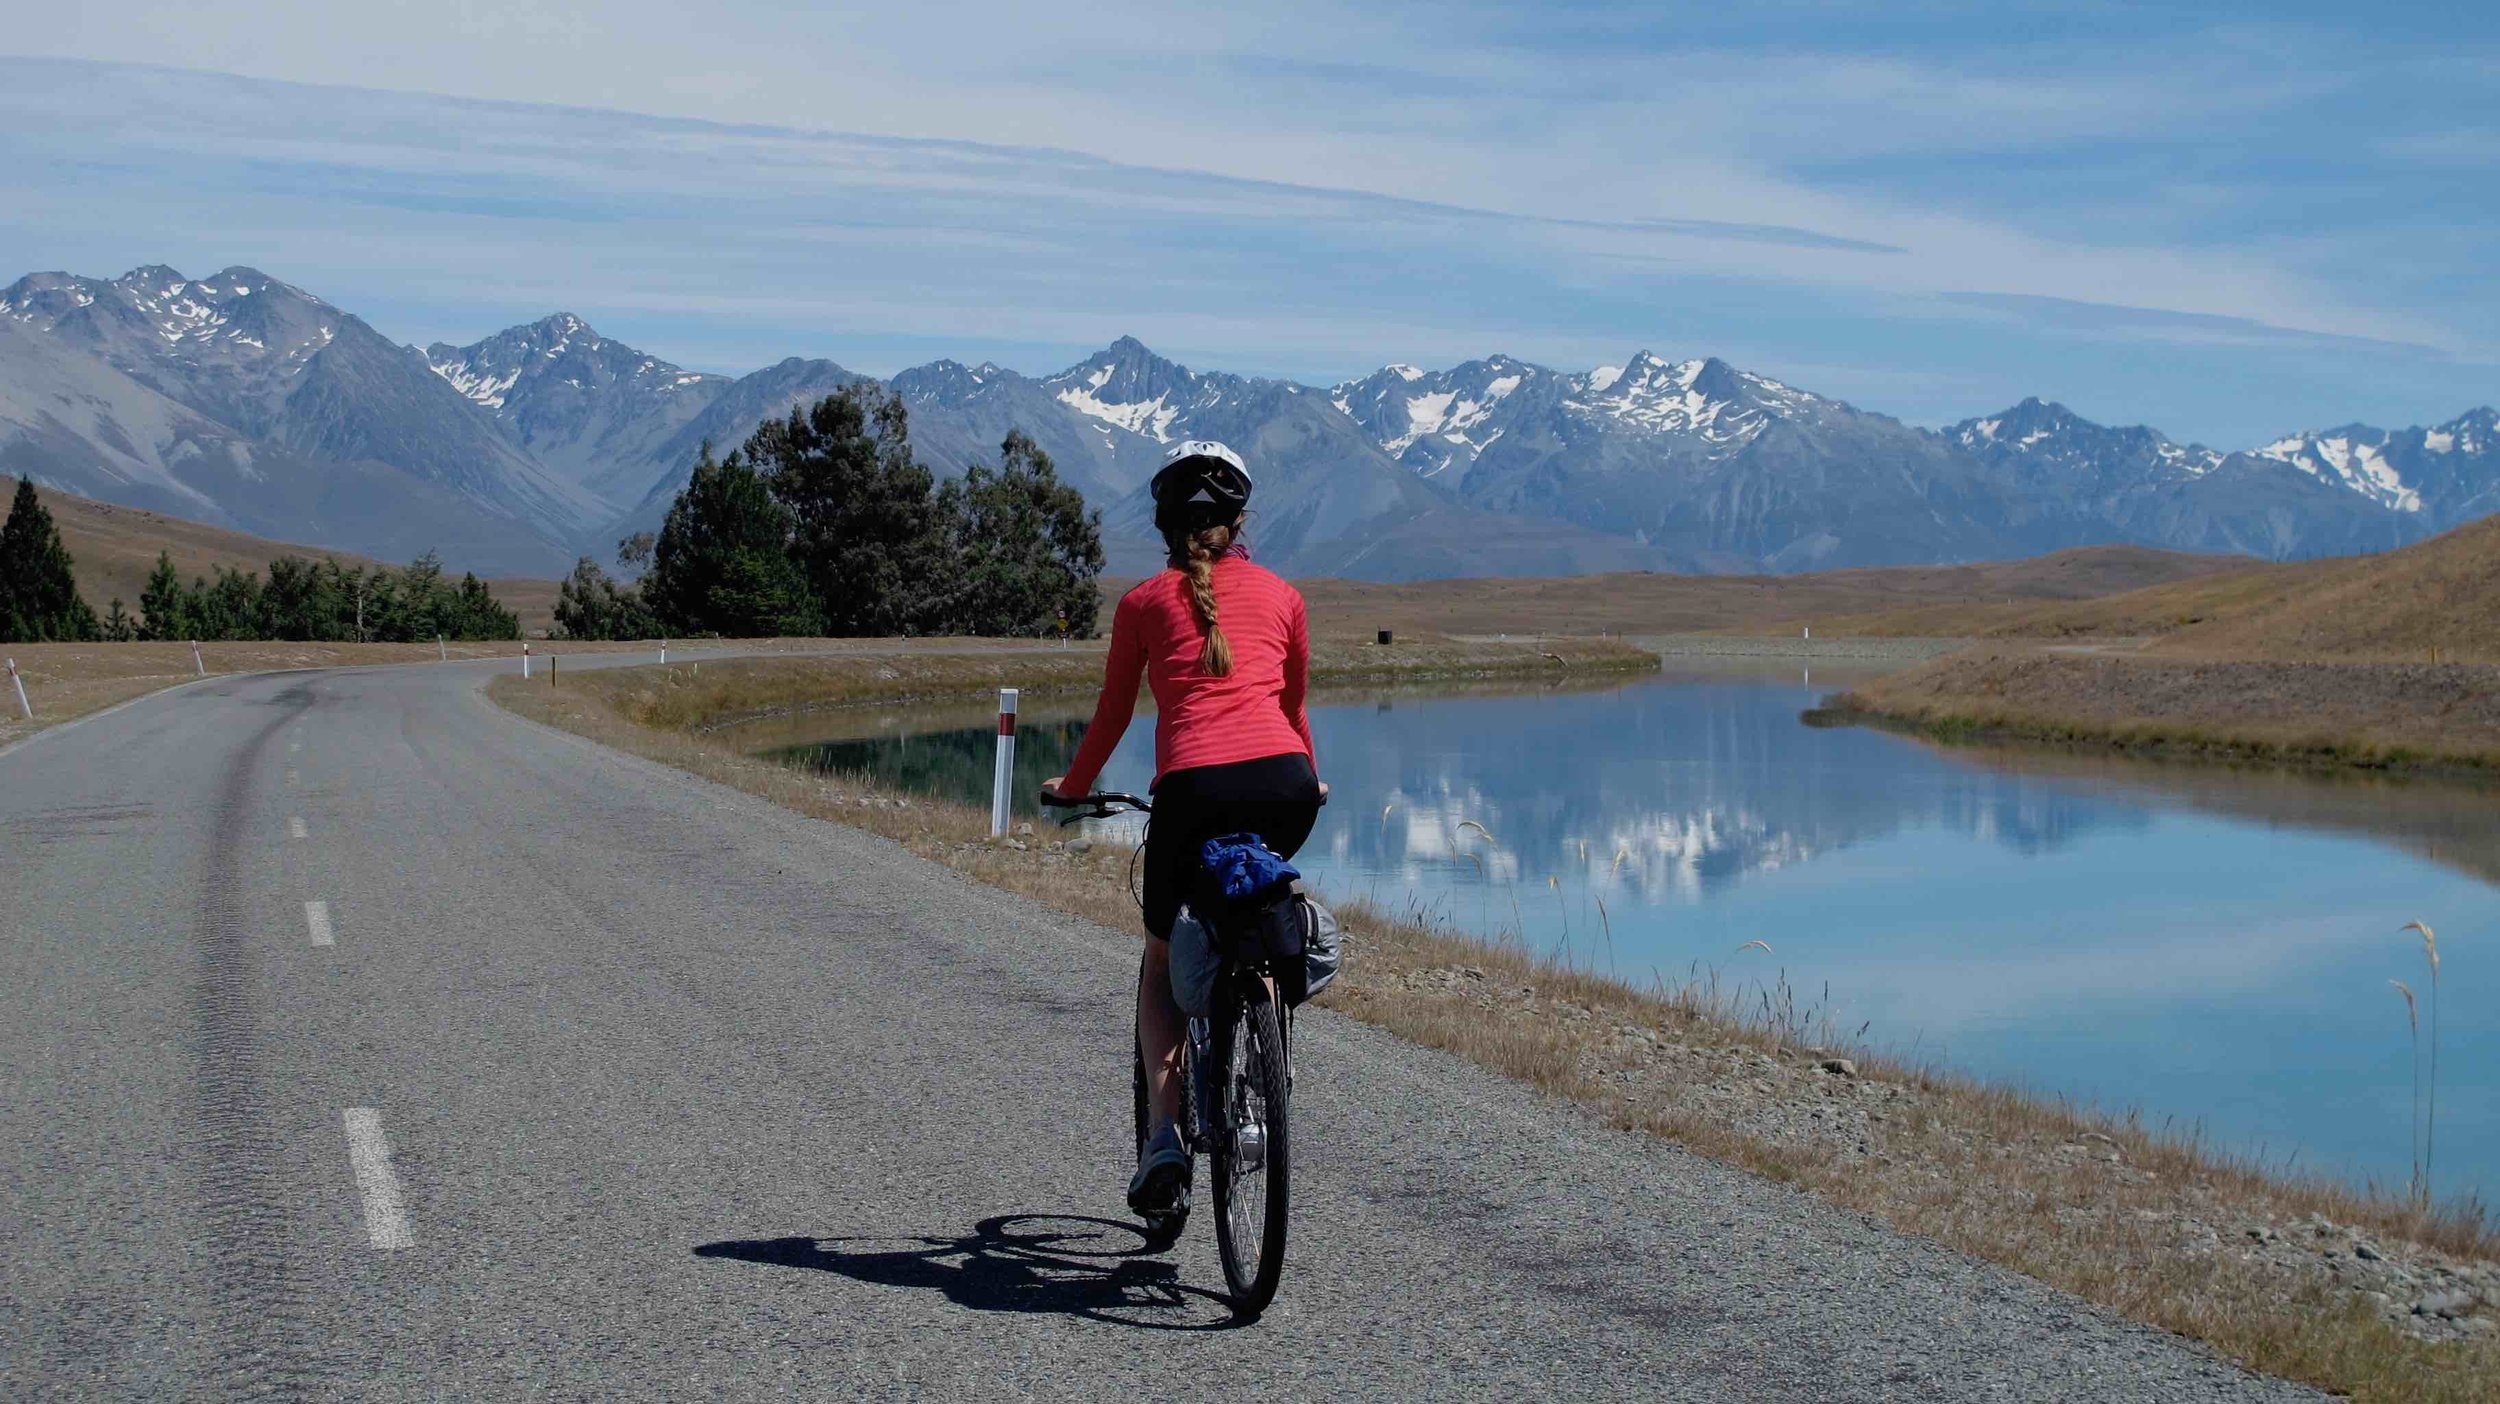 Summer New Zealand Biking arount Mount Cook Lake Tekapo.jpg